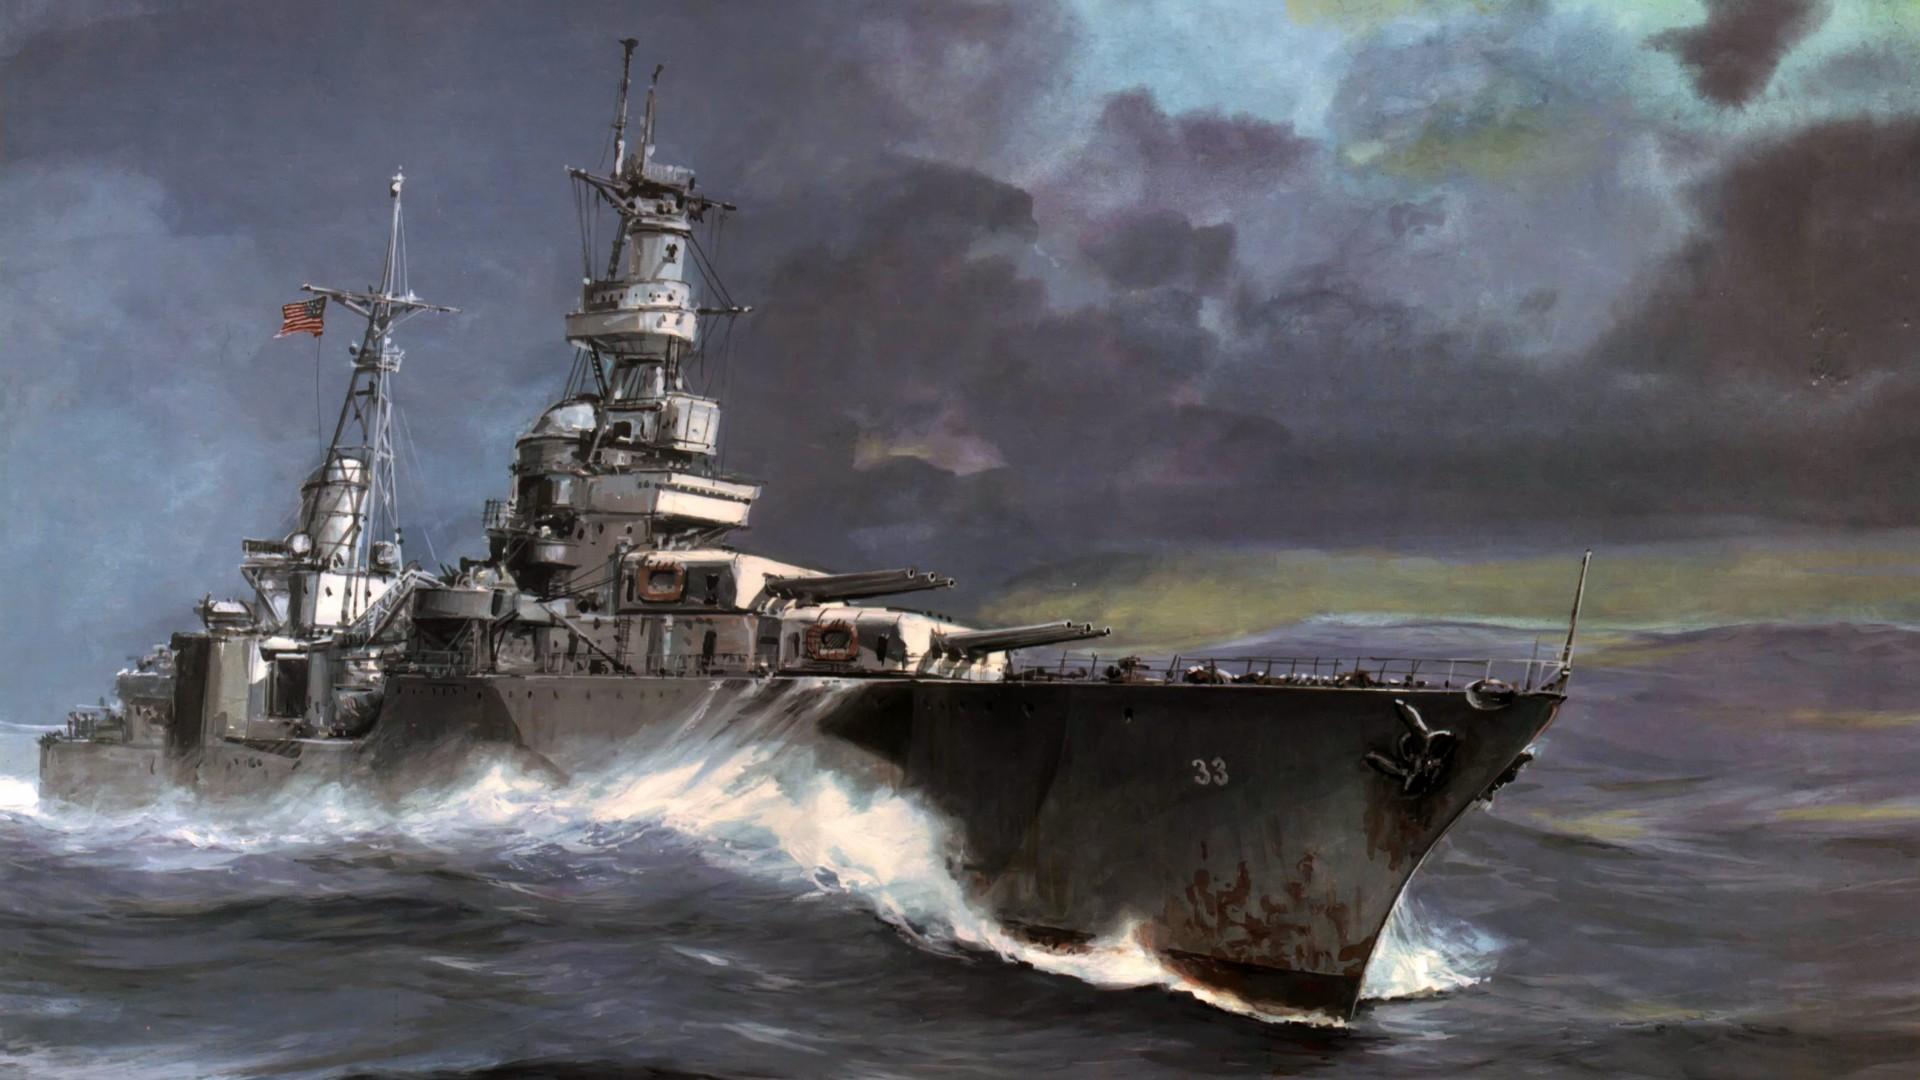 us battleship wallpaper - wallpapersafari